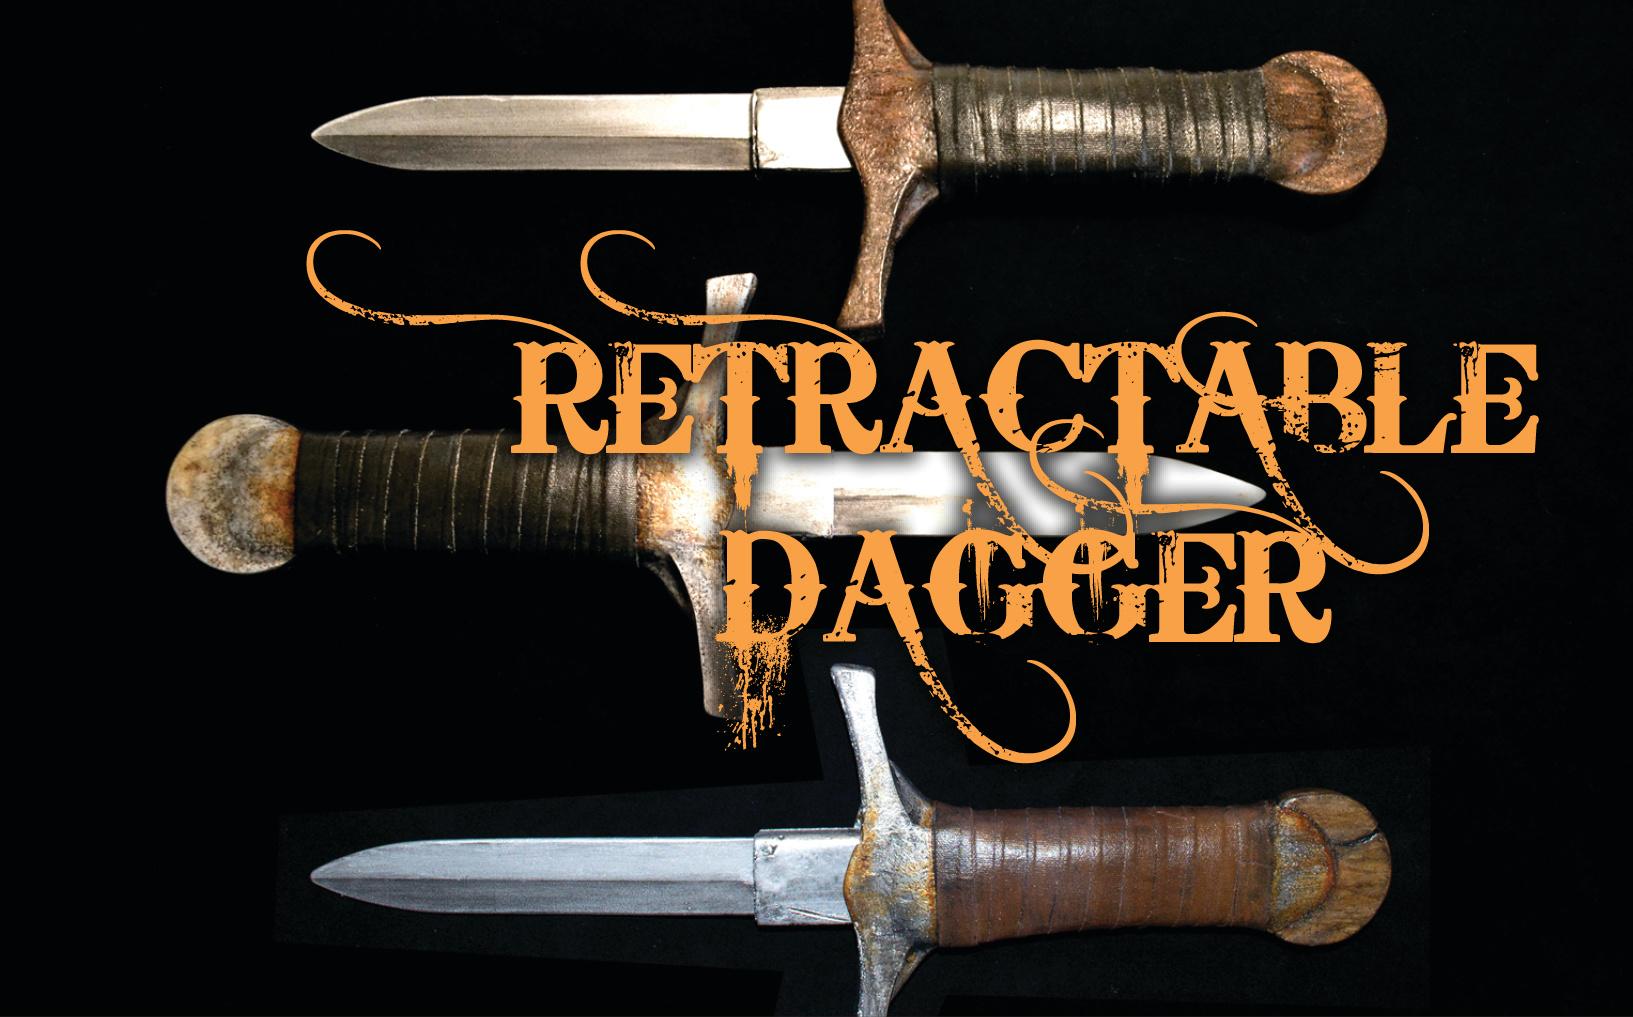 Retractable Dagger